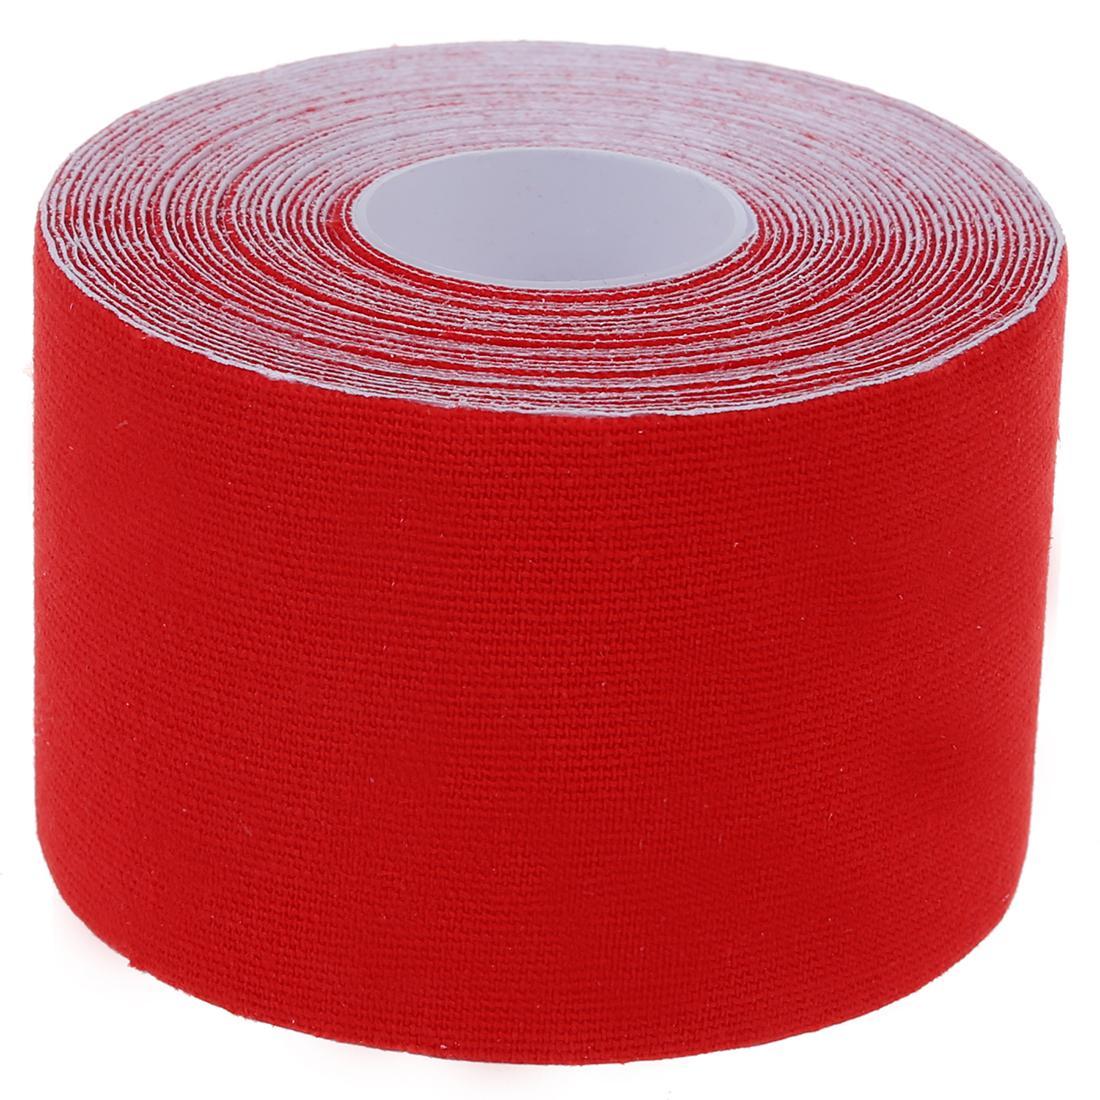 Atacado- 1 Roll Sports Kinesiology Músculos Cuidados Fitness Athletic Health Tape 5M * 5CM - Vermelho